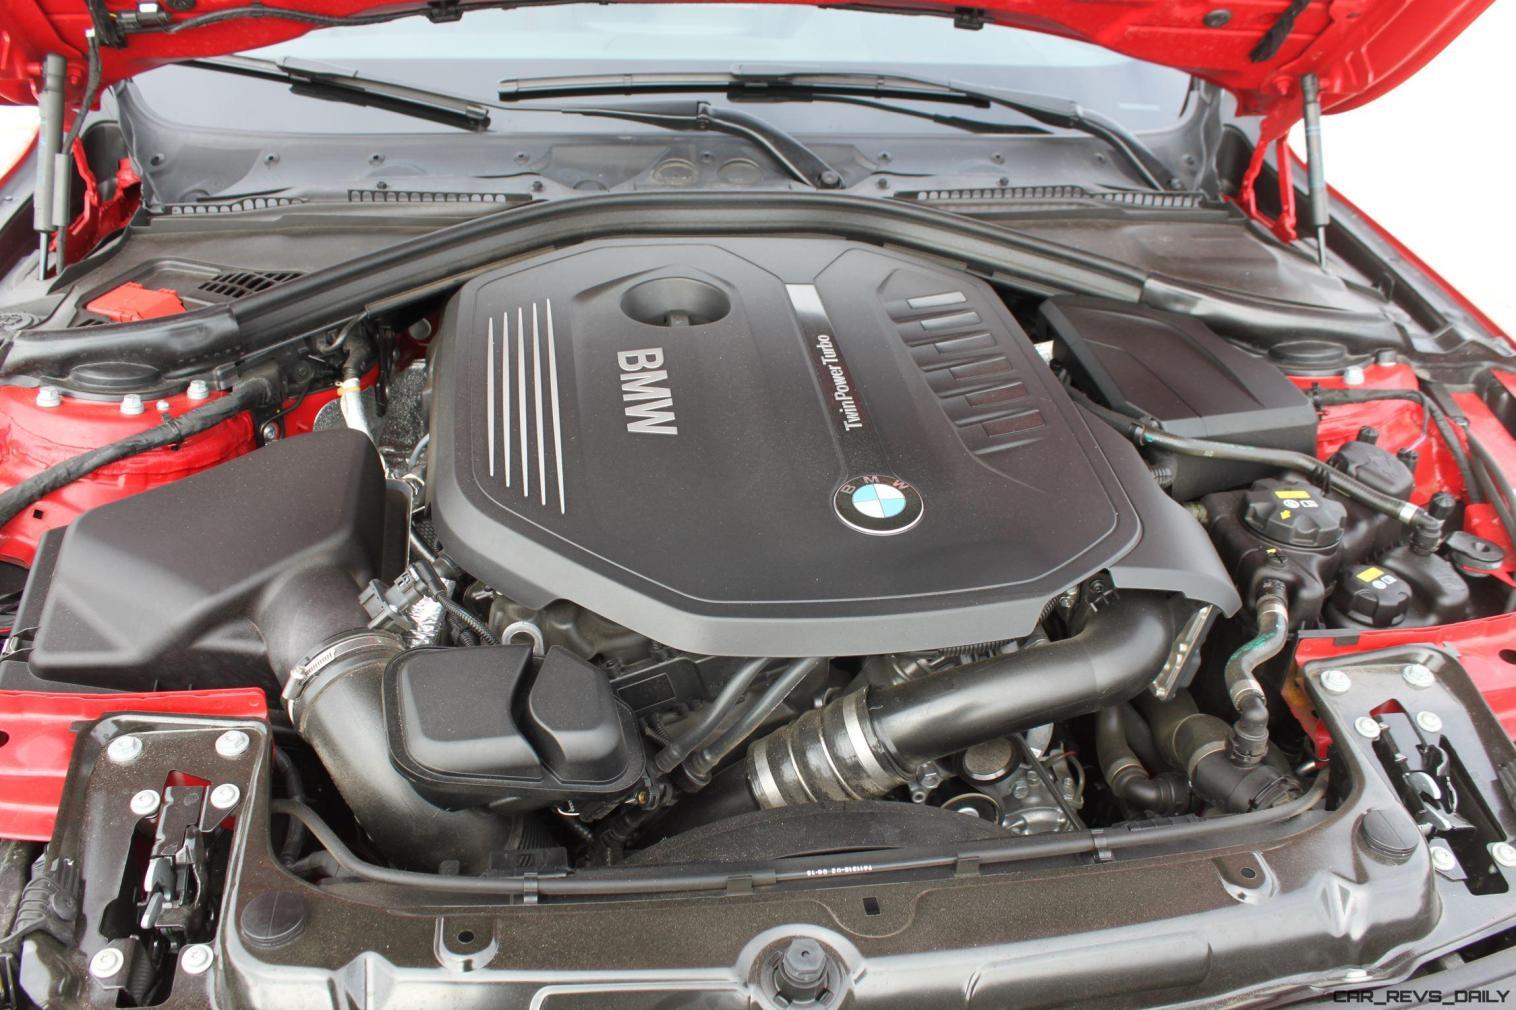 Road Test Review - 2016 BMW 340i xDrive - By Tim Esterdahl 13